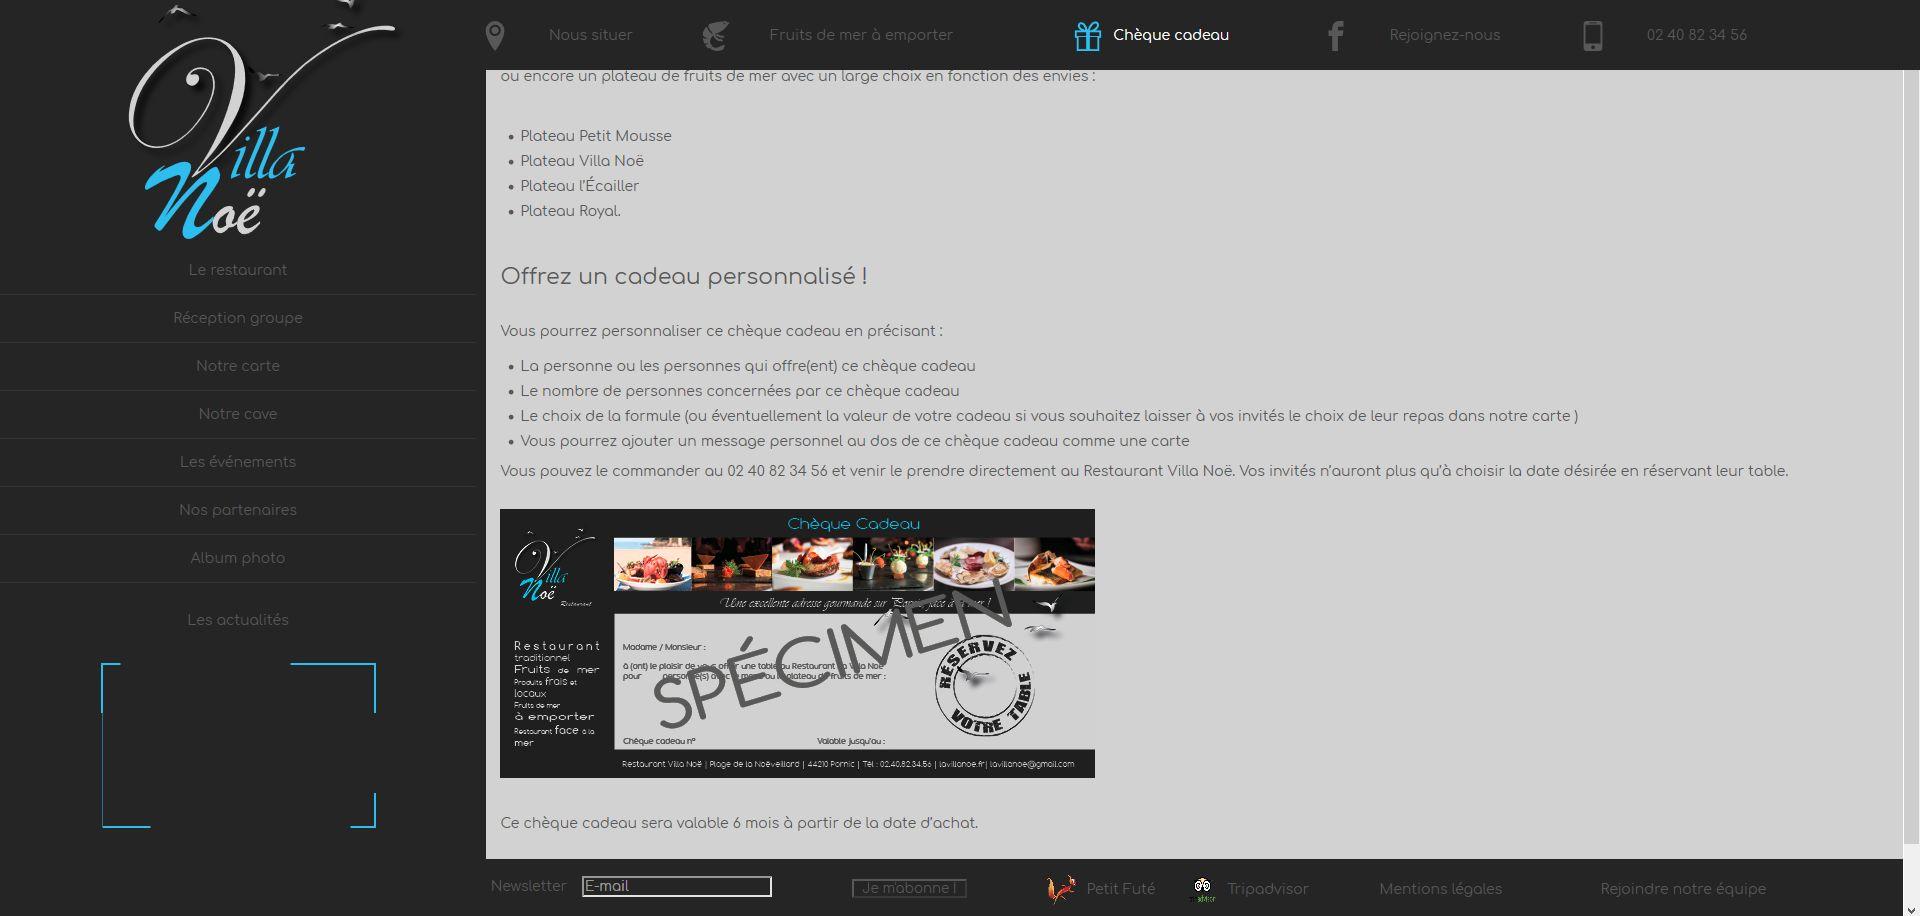 restaurant-villa-noe-pornic-cheque-cadeau